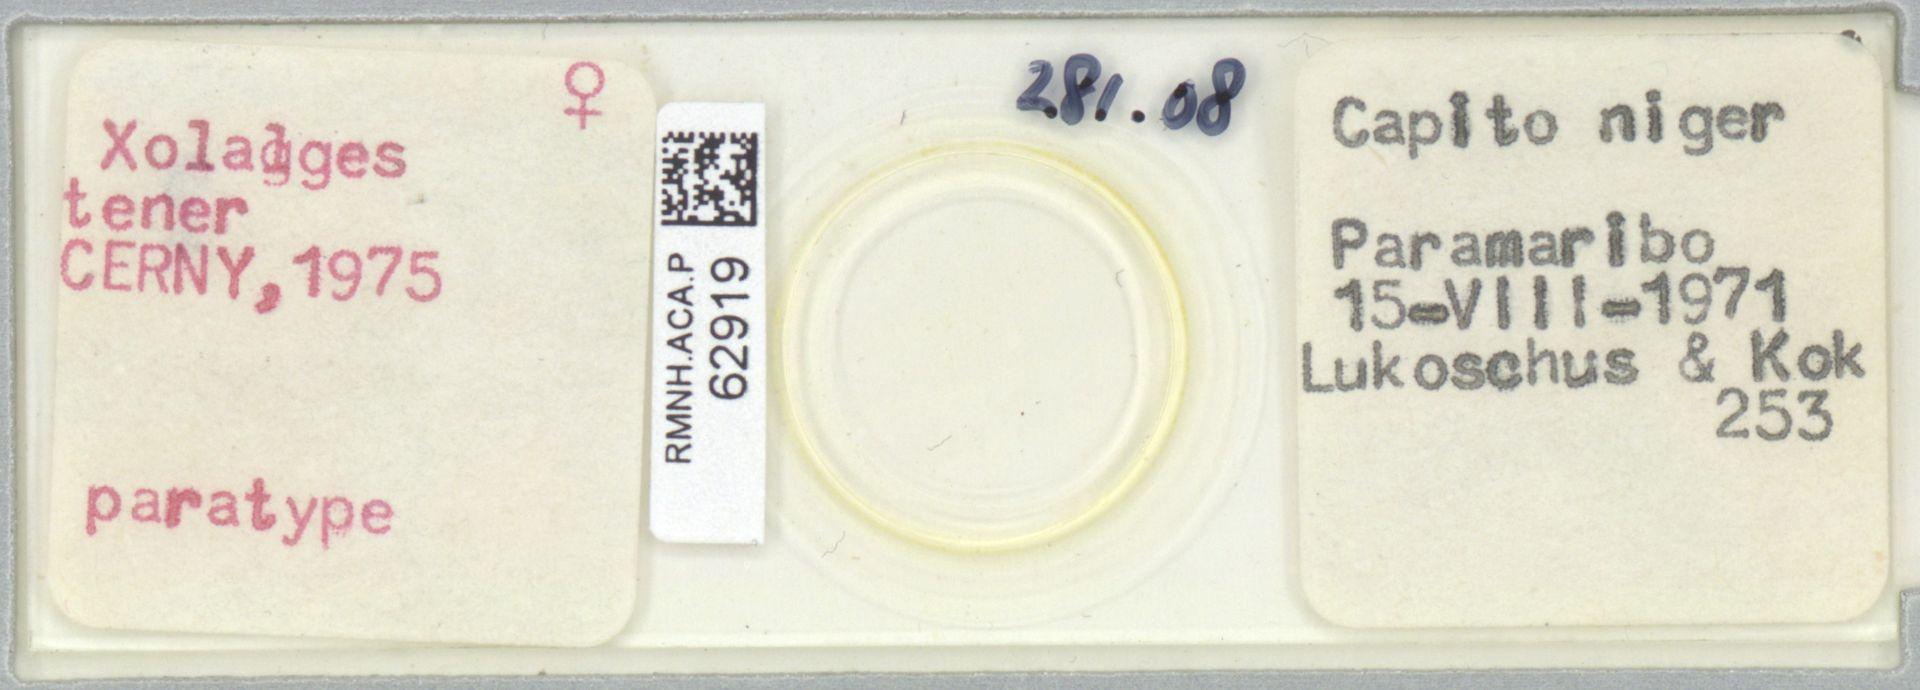 RMNH.ACA.P.62919   Xolalges tener Cerny, 1975